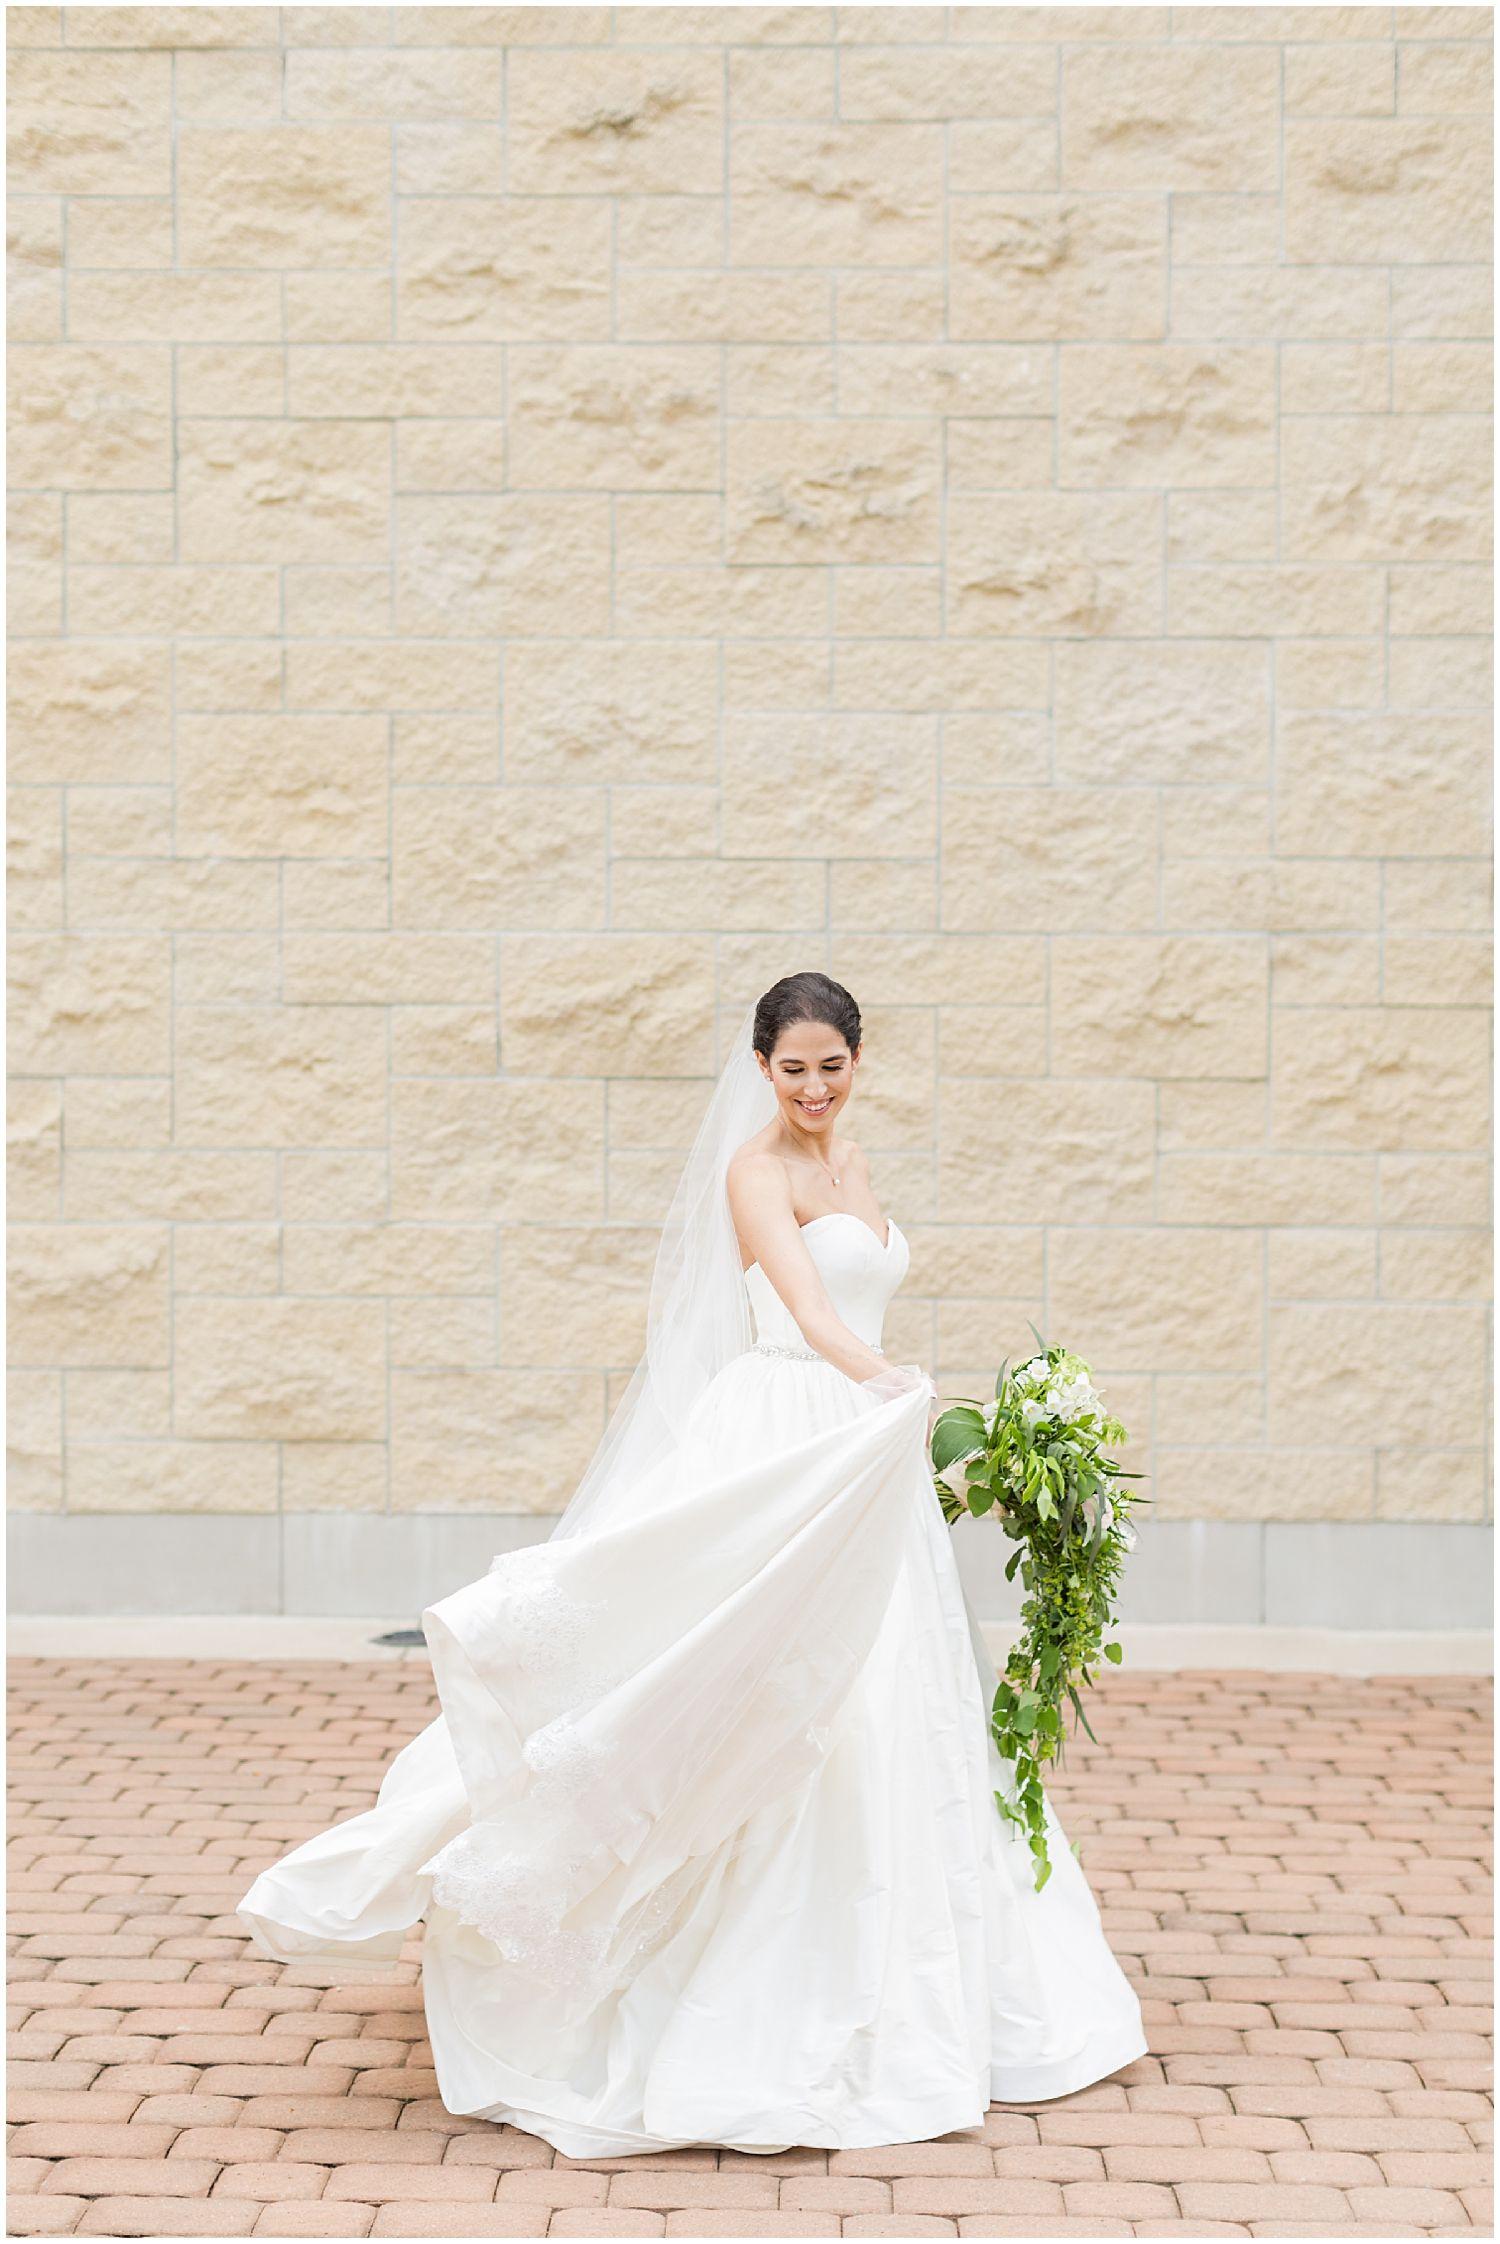 A Catholic Wedding Celebration in Greenville, SC Wedding